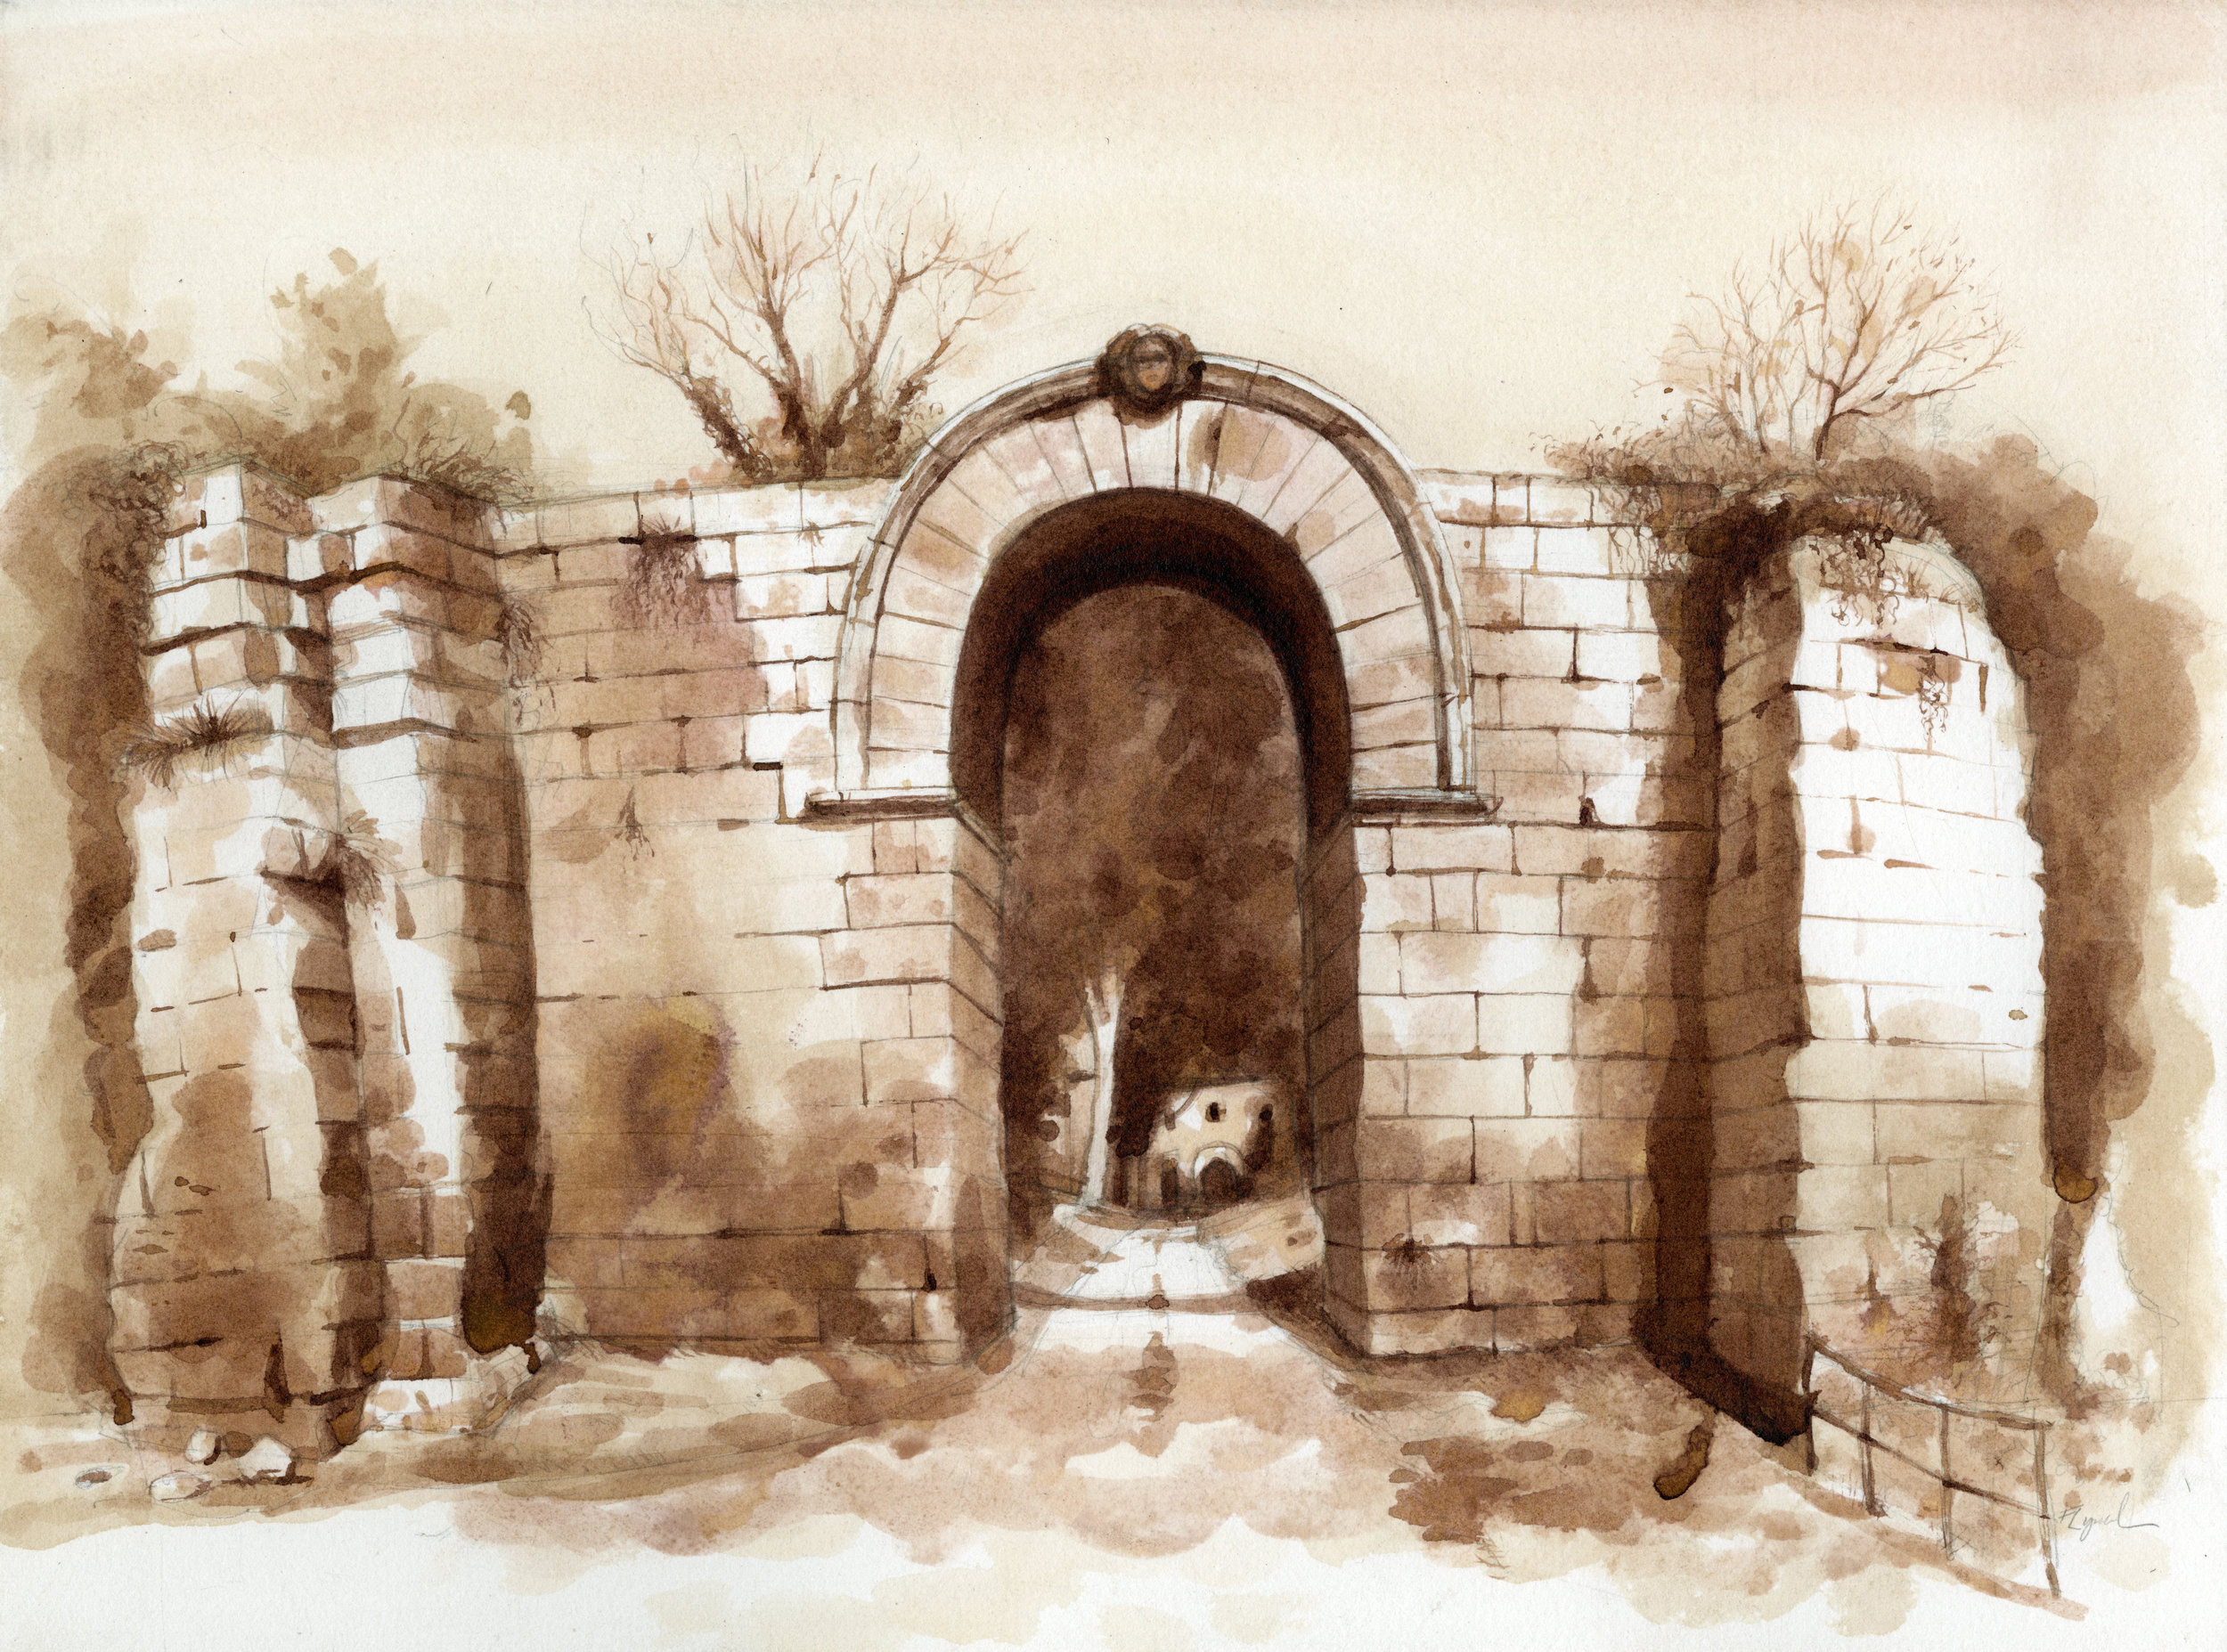 The Gate of Giove, Falerii Novi